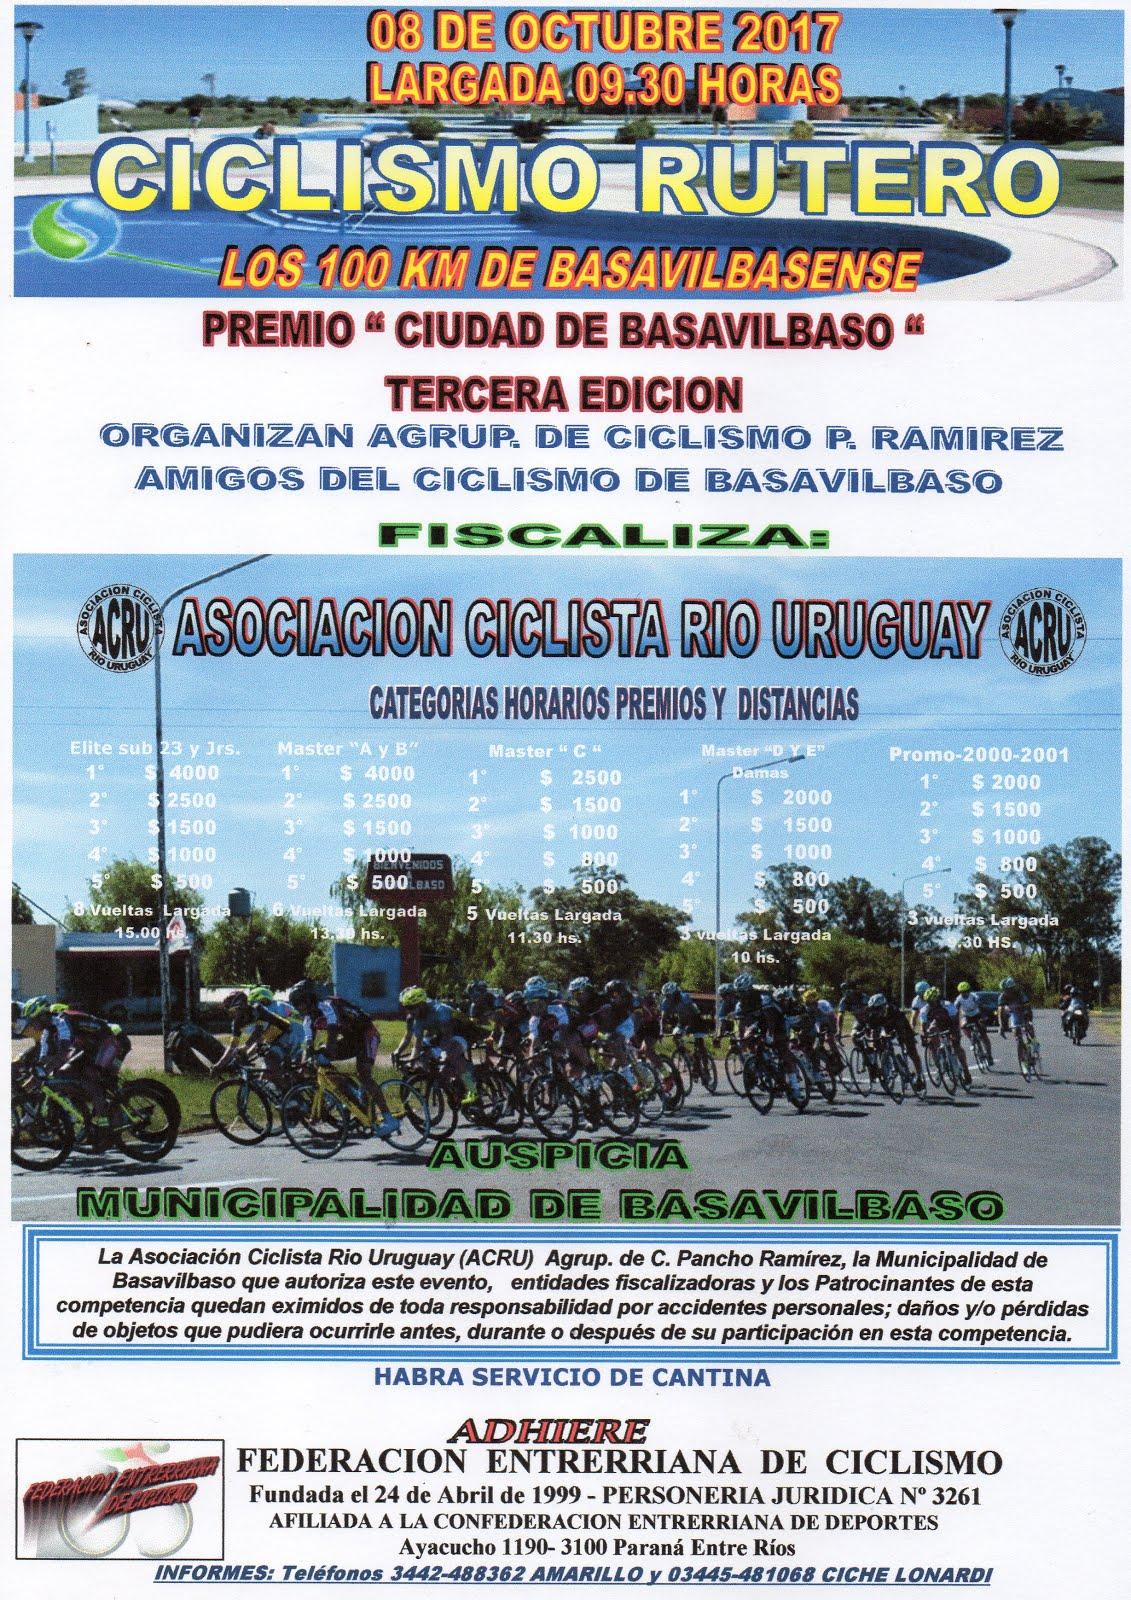 Basavilbaso - 100 Km Ciclismo Rutero